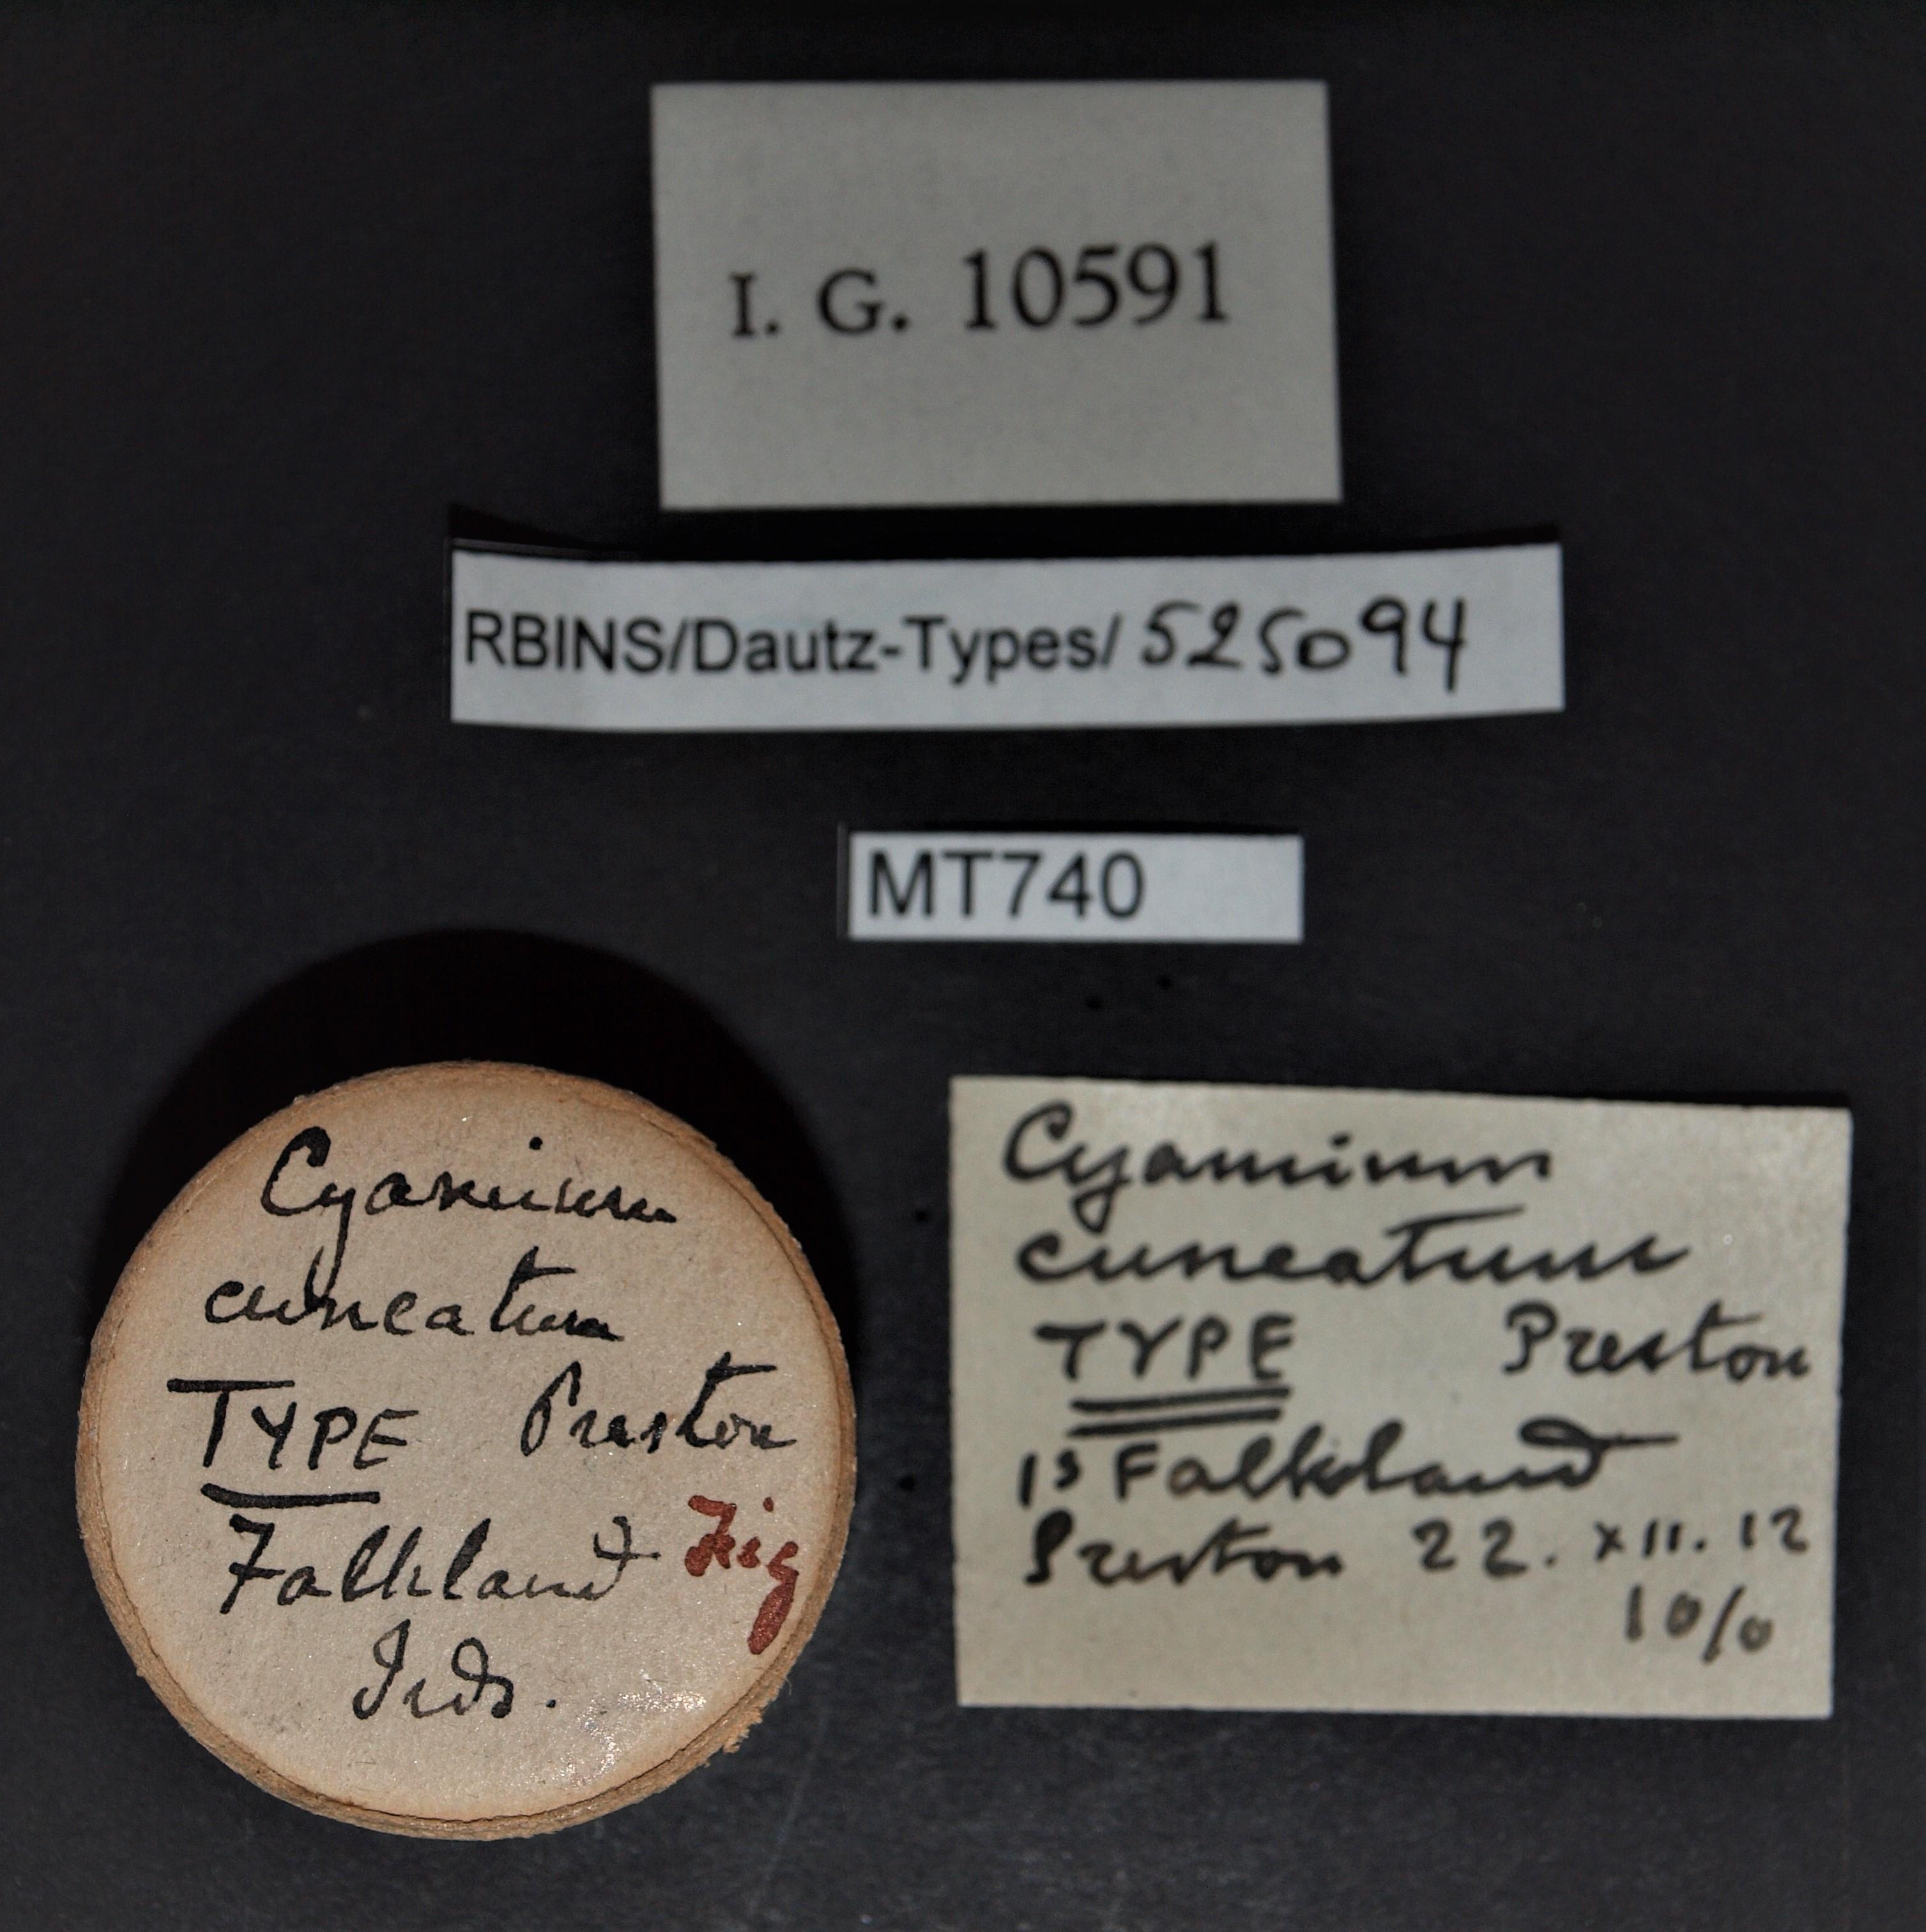 Cyamium cuneatum t.JPG